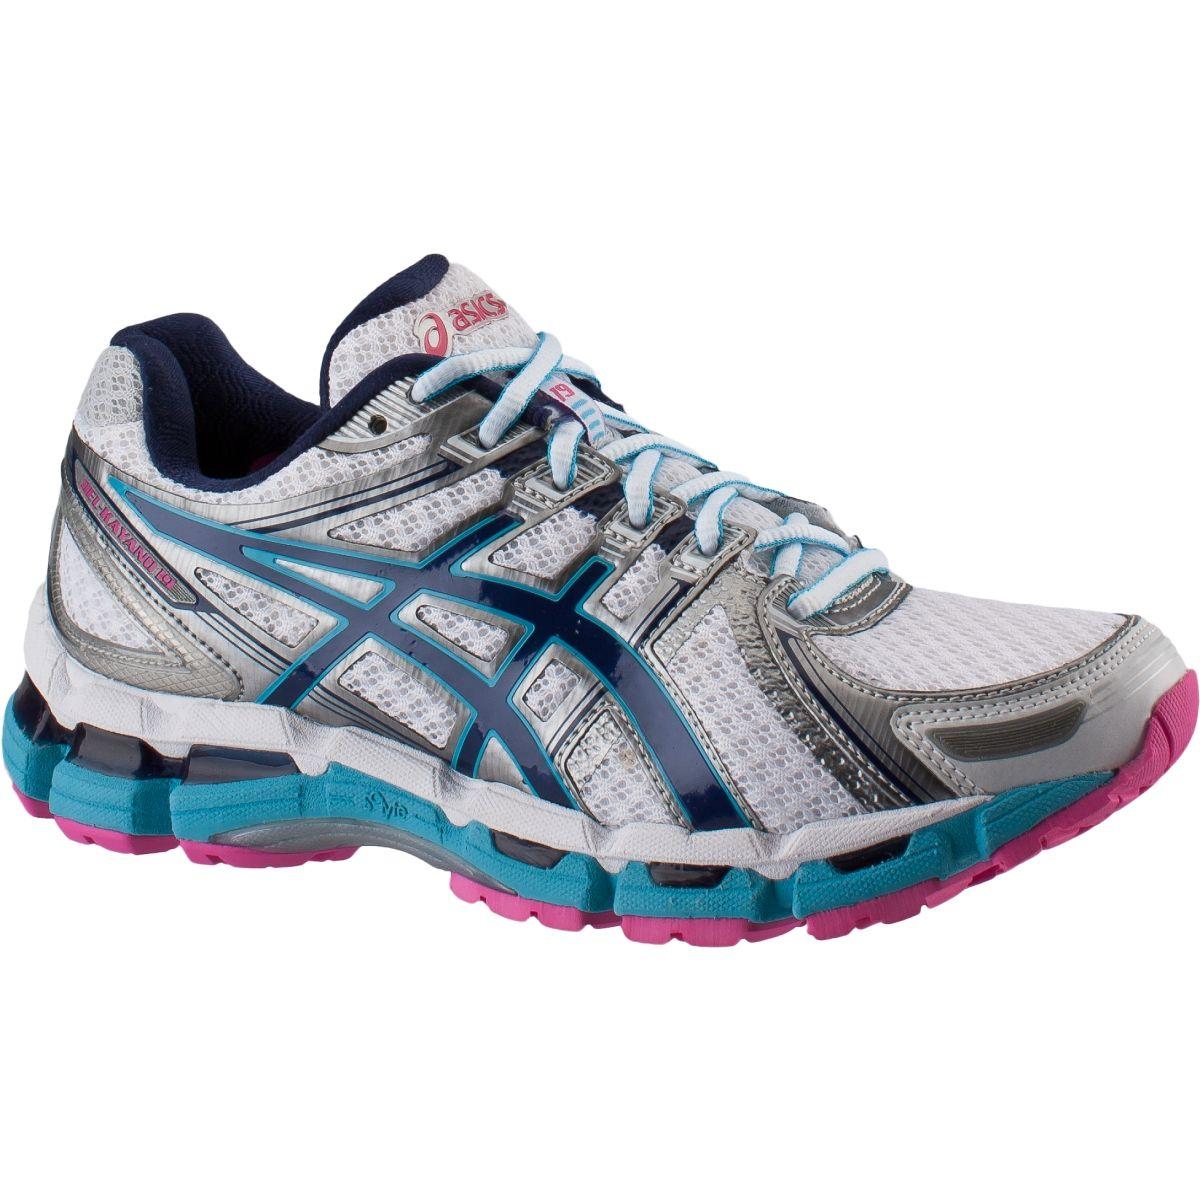 Asics Gel Kayano 19 Running Shoes Womens Sportchek Ca Shoes